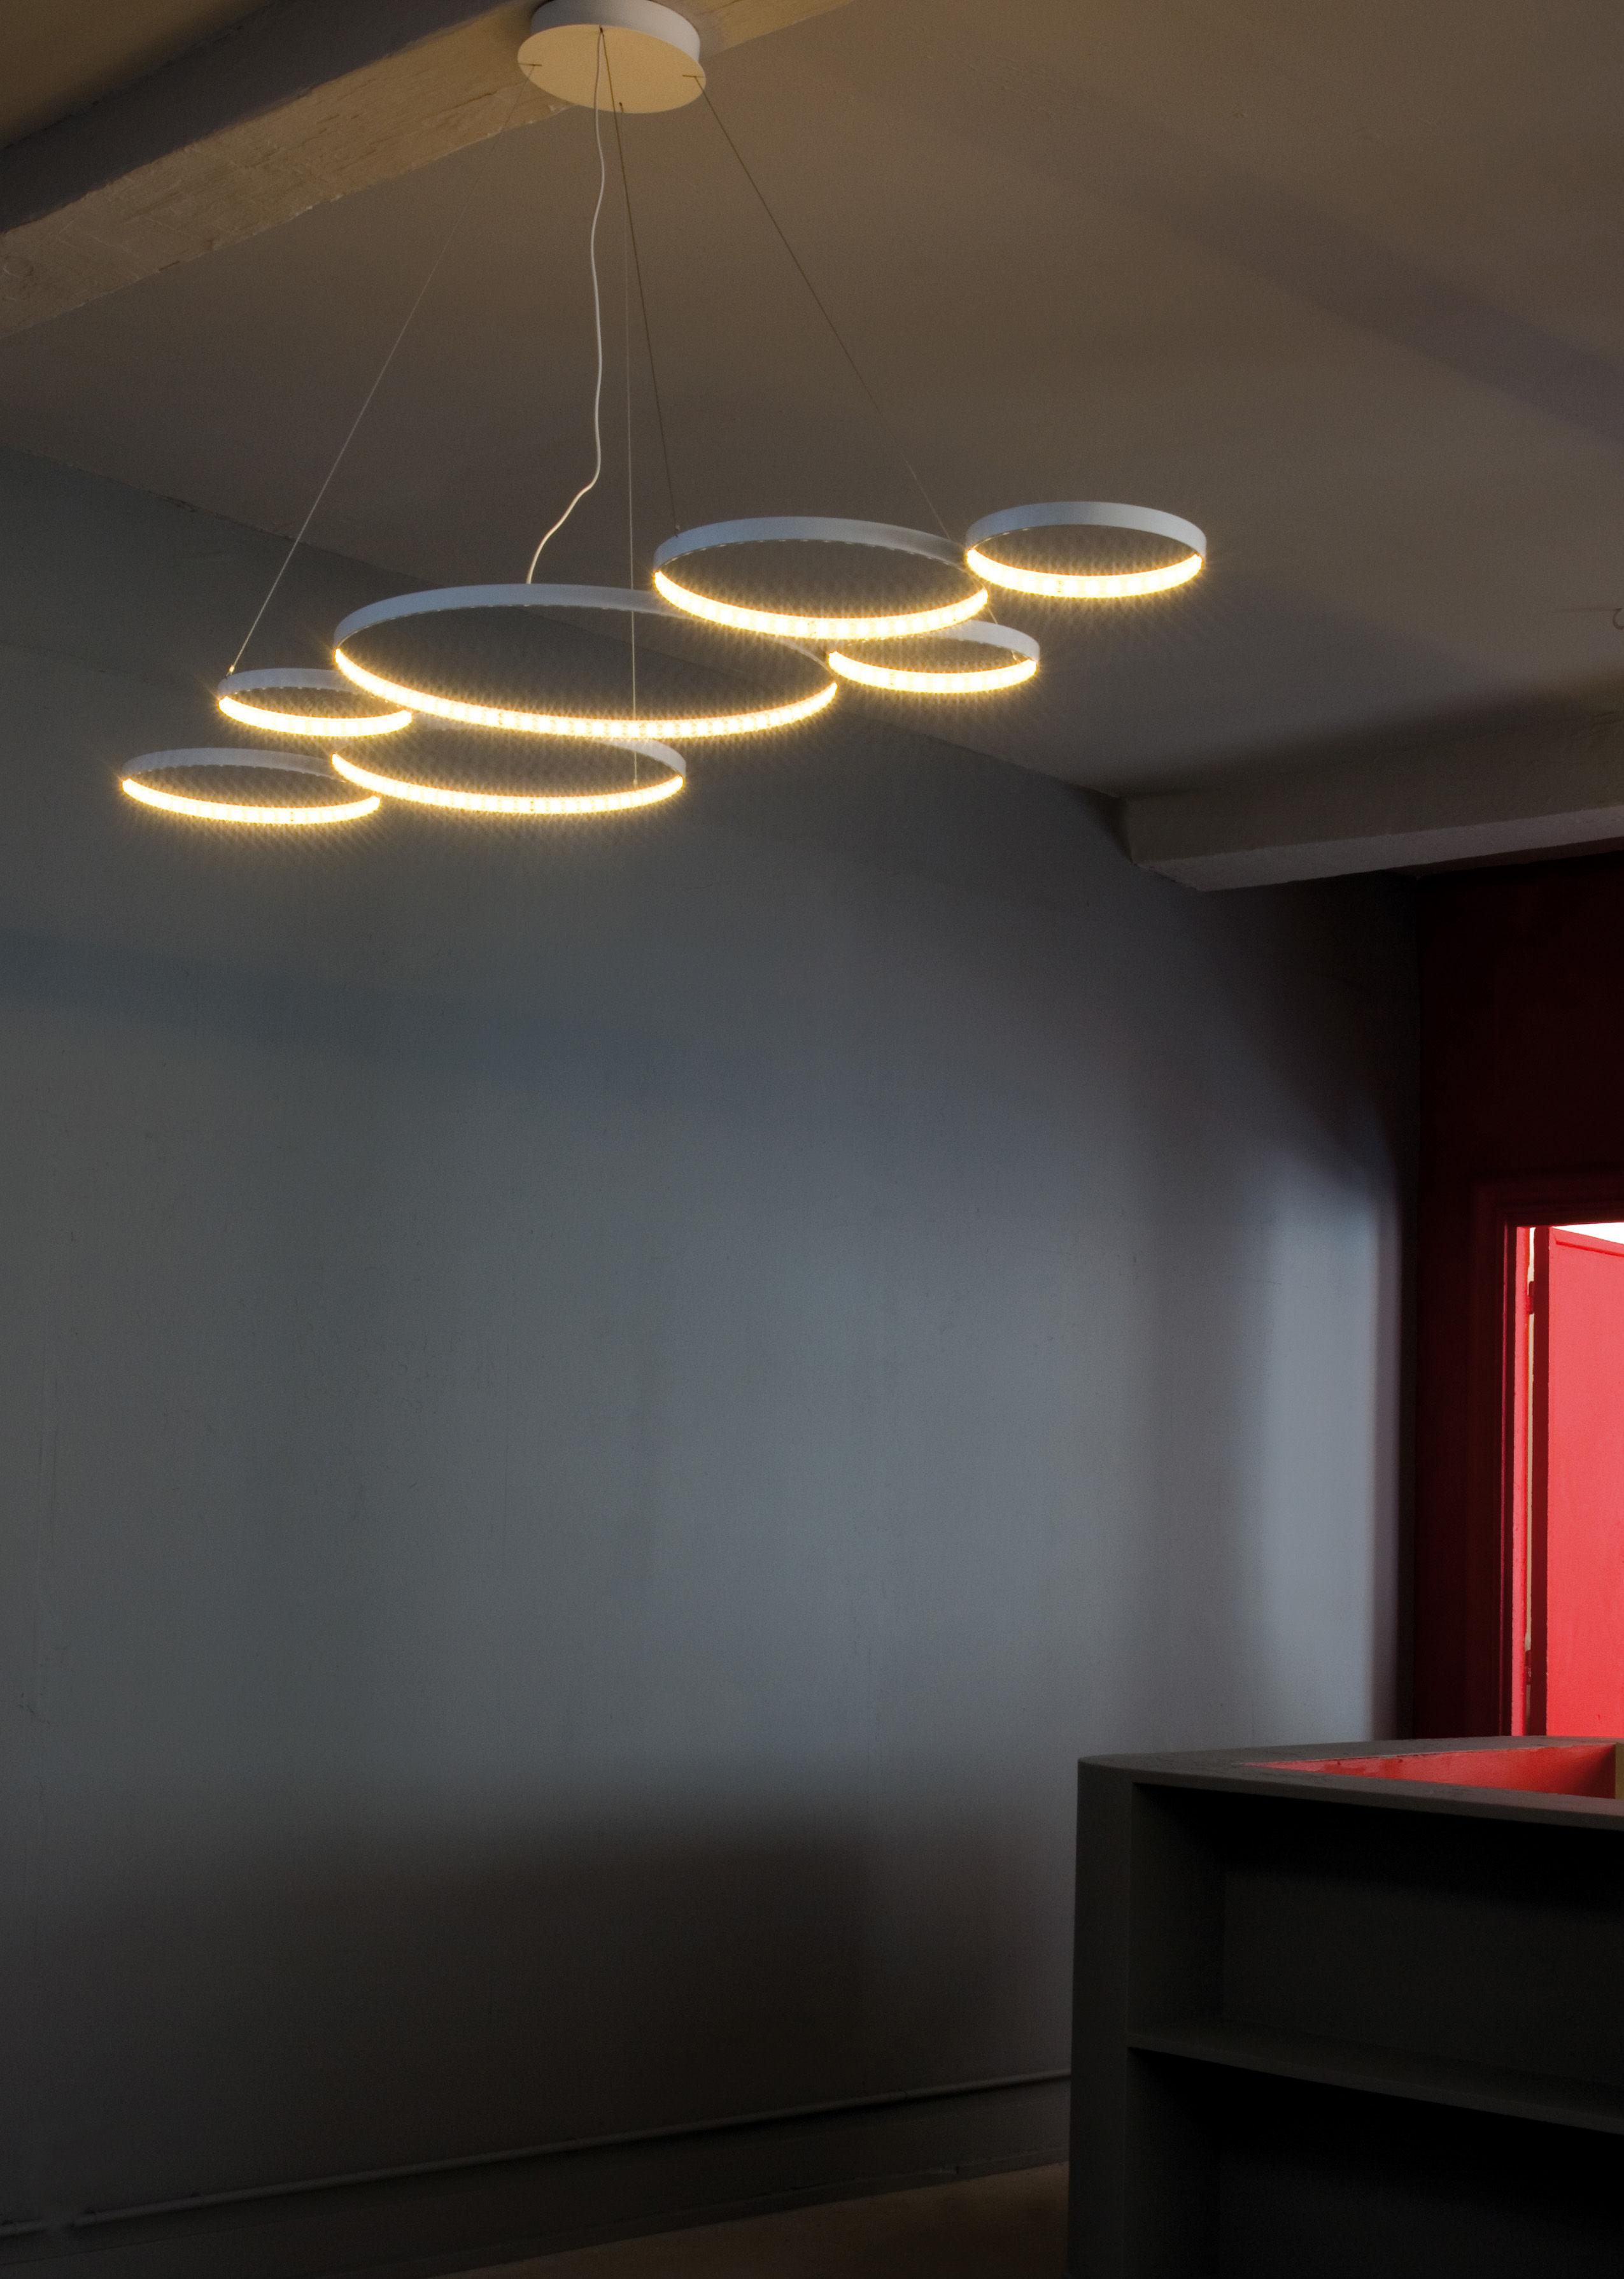 suspension ultra8 led 180 x 50 cm blanc le deun. Black Bedroom Furniture Sets. Home Design Ideas